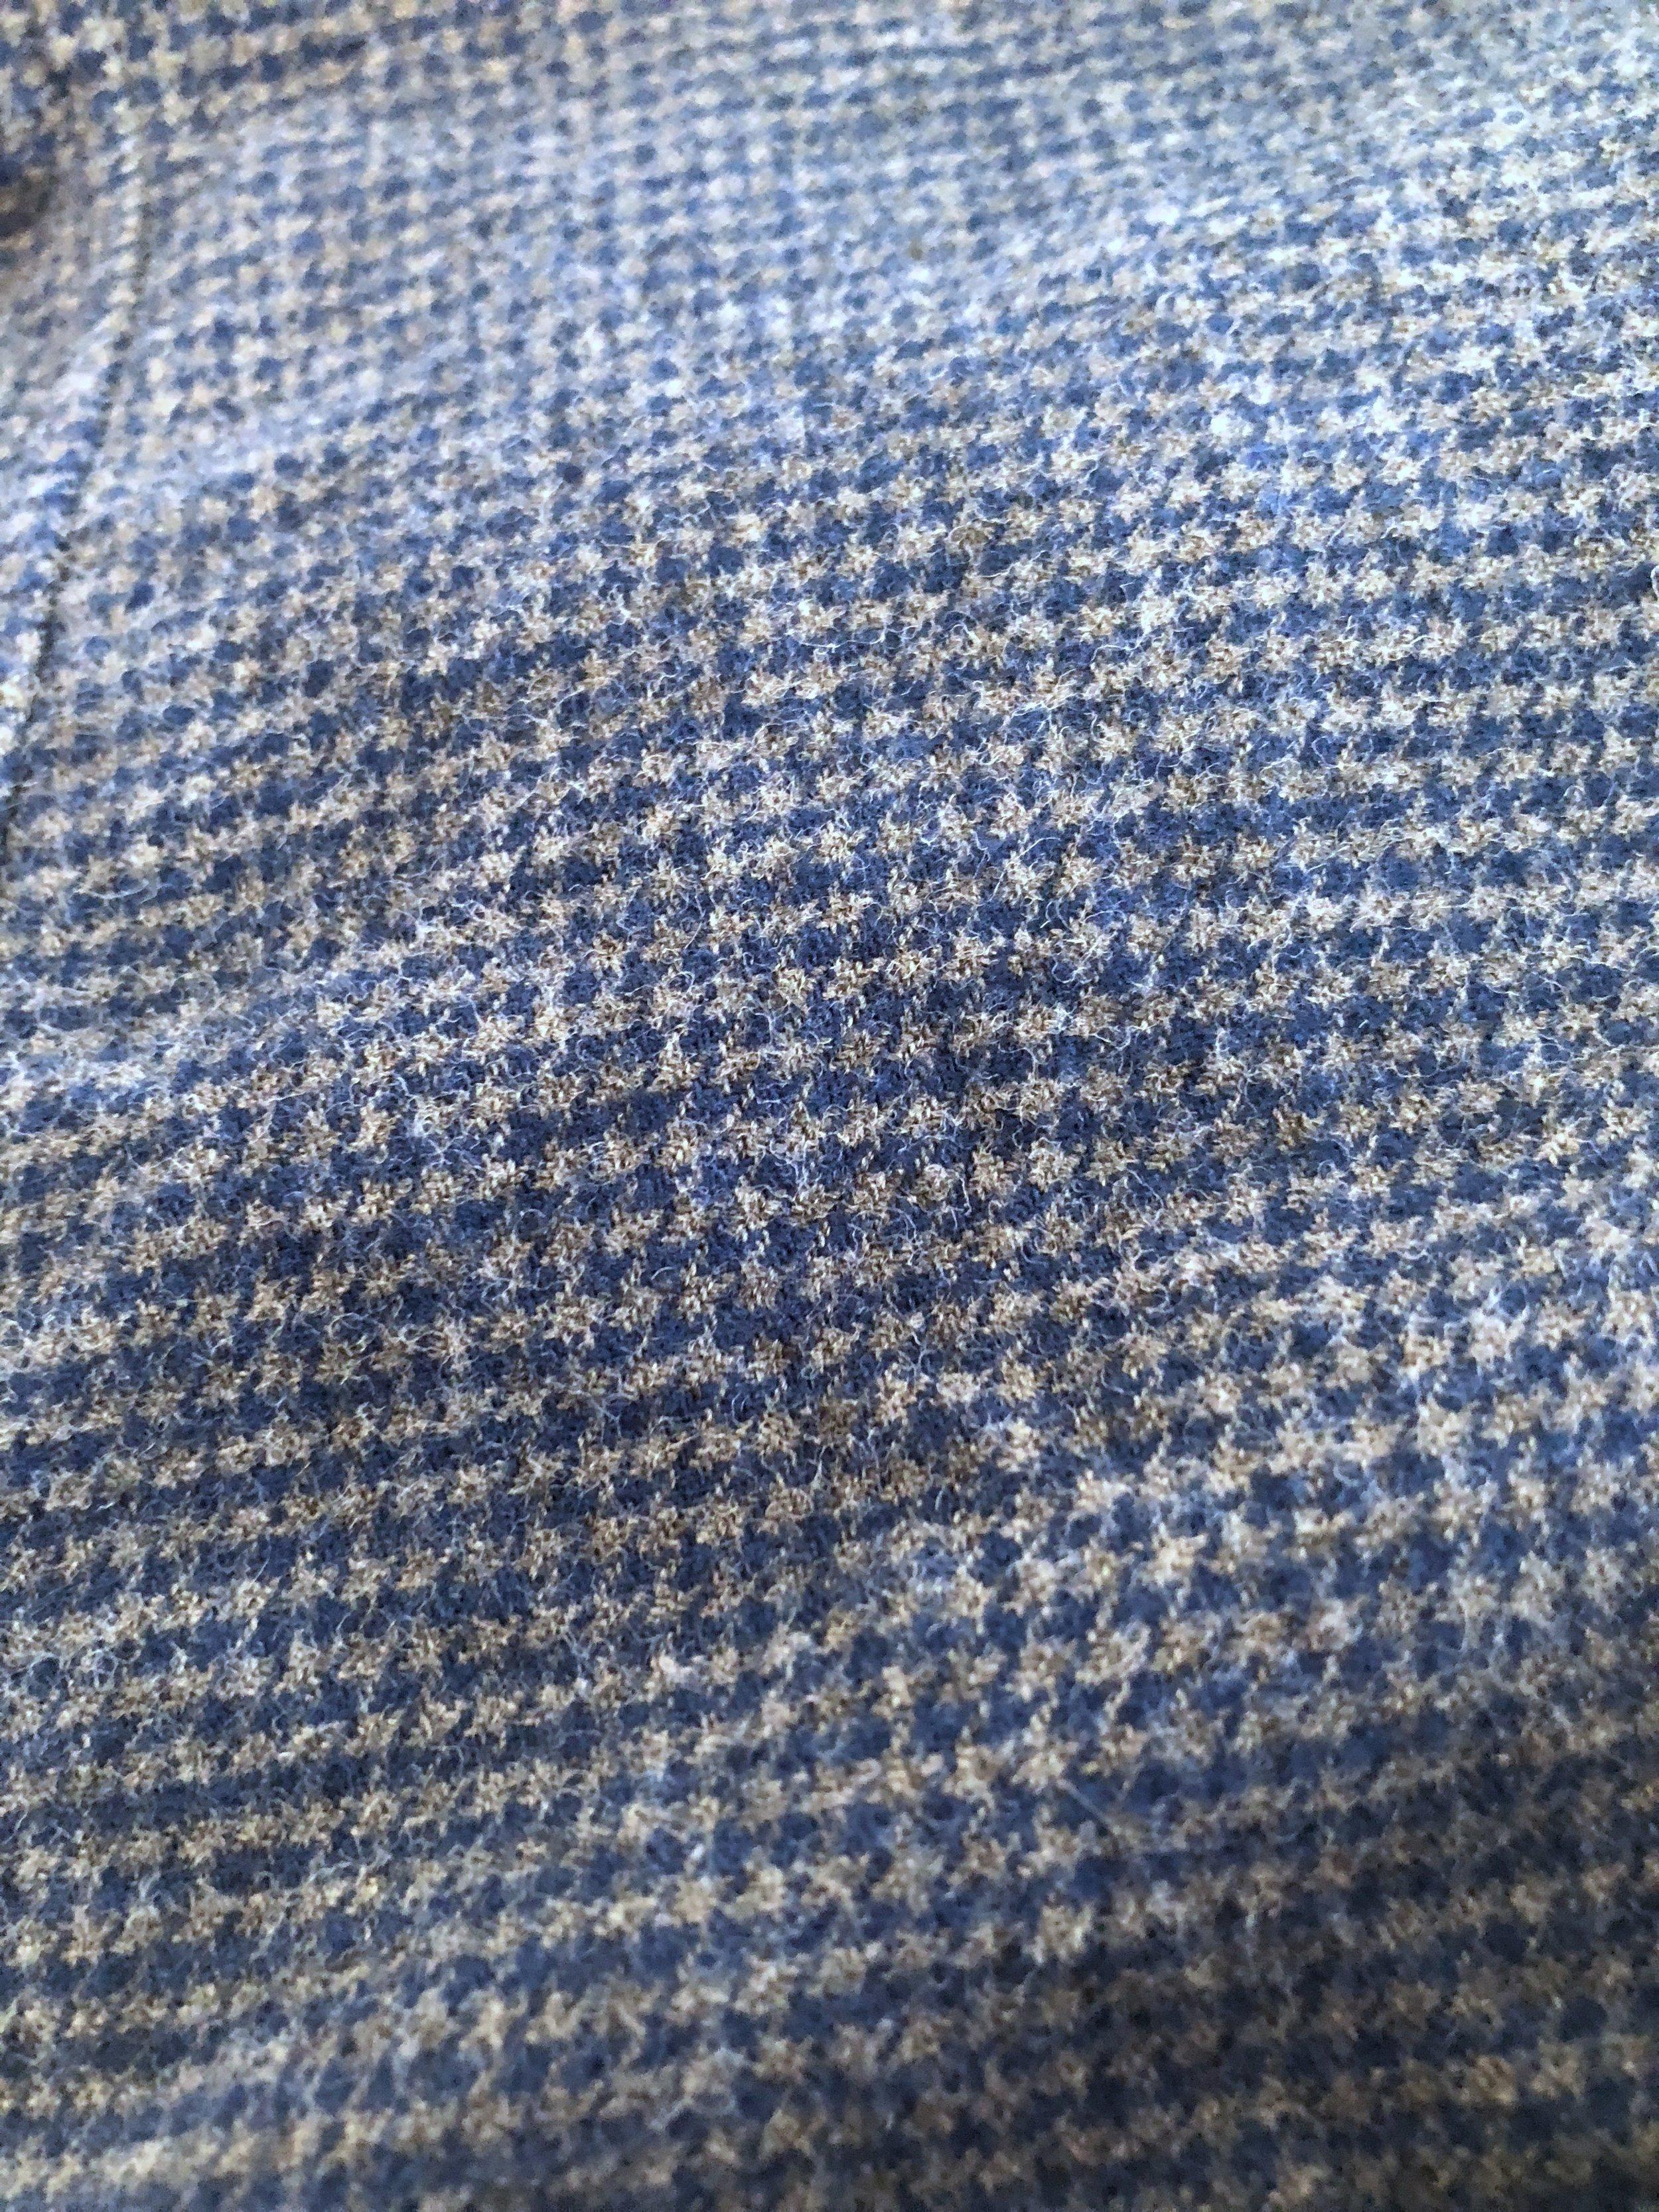 Close-up of the shirt fabric